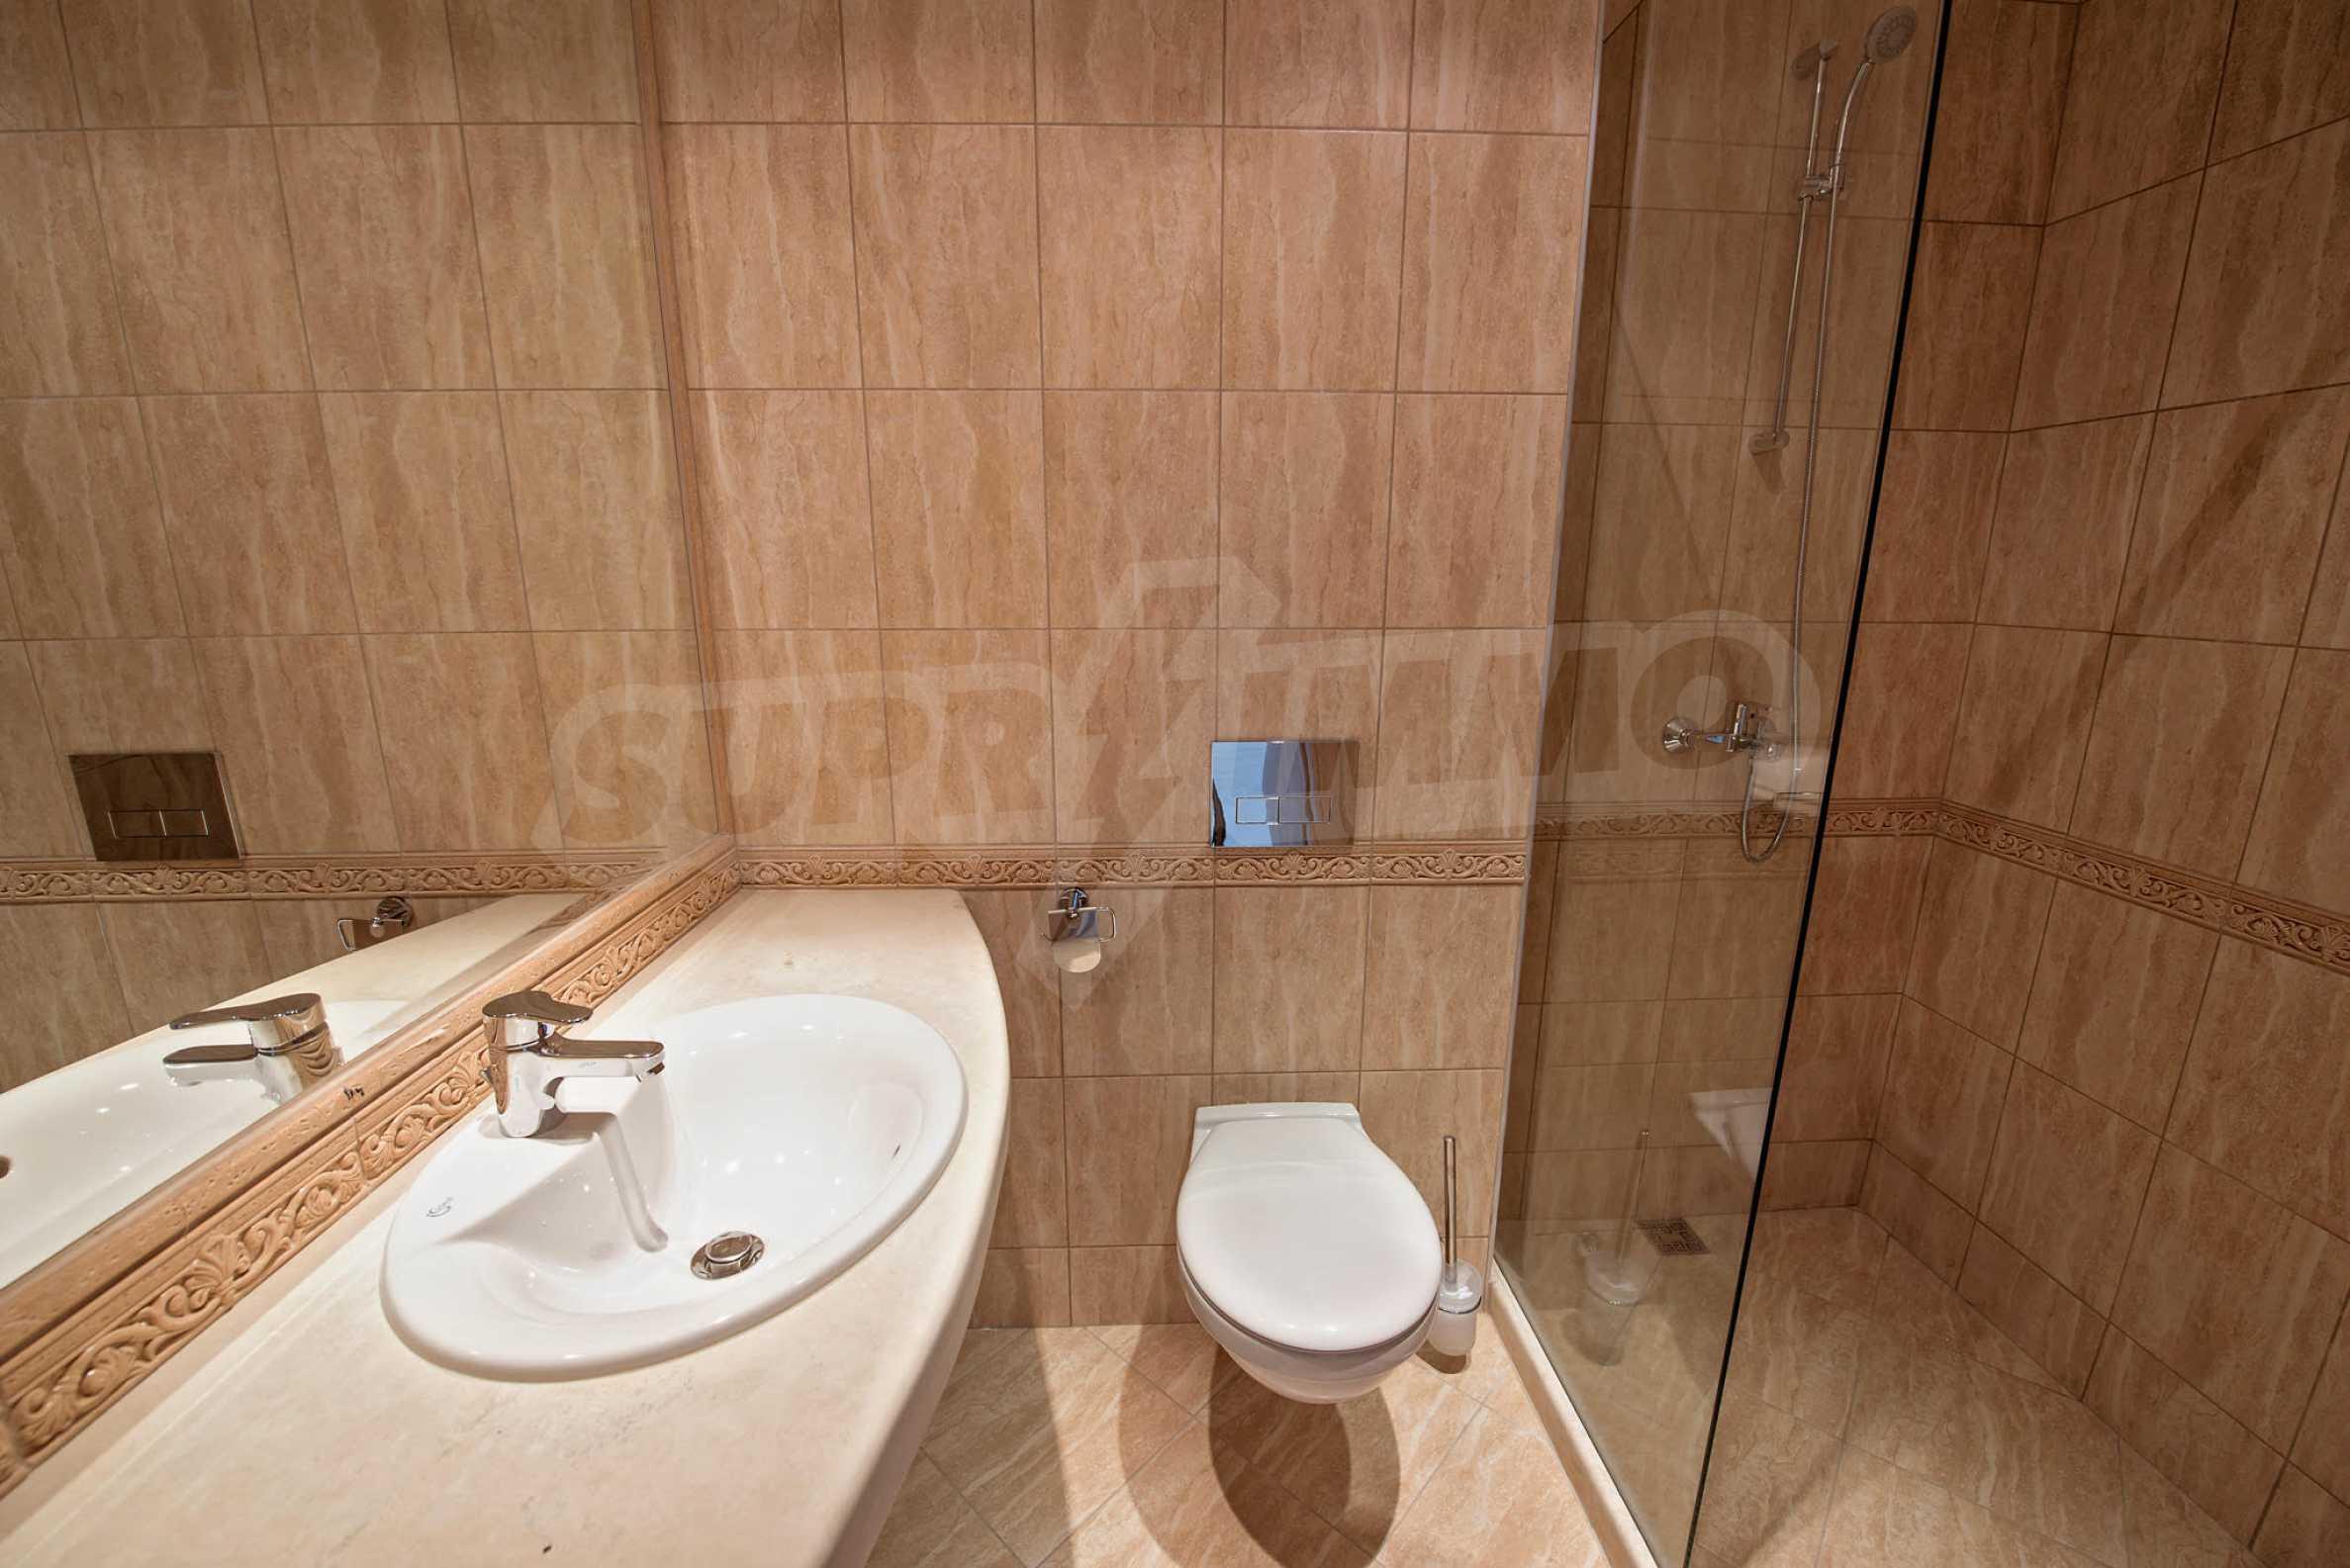 Двустаен апартамент във Варна Саут Бей / Varna South Bay 7